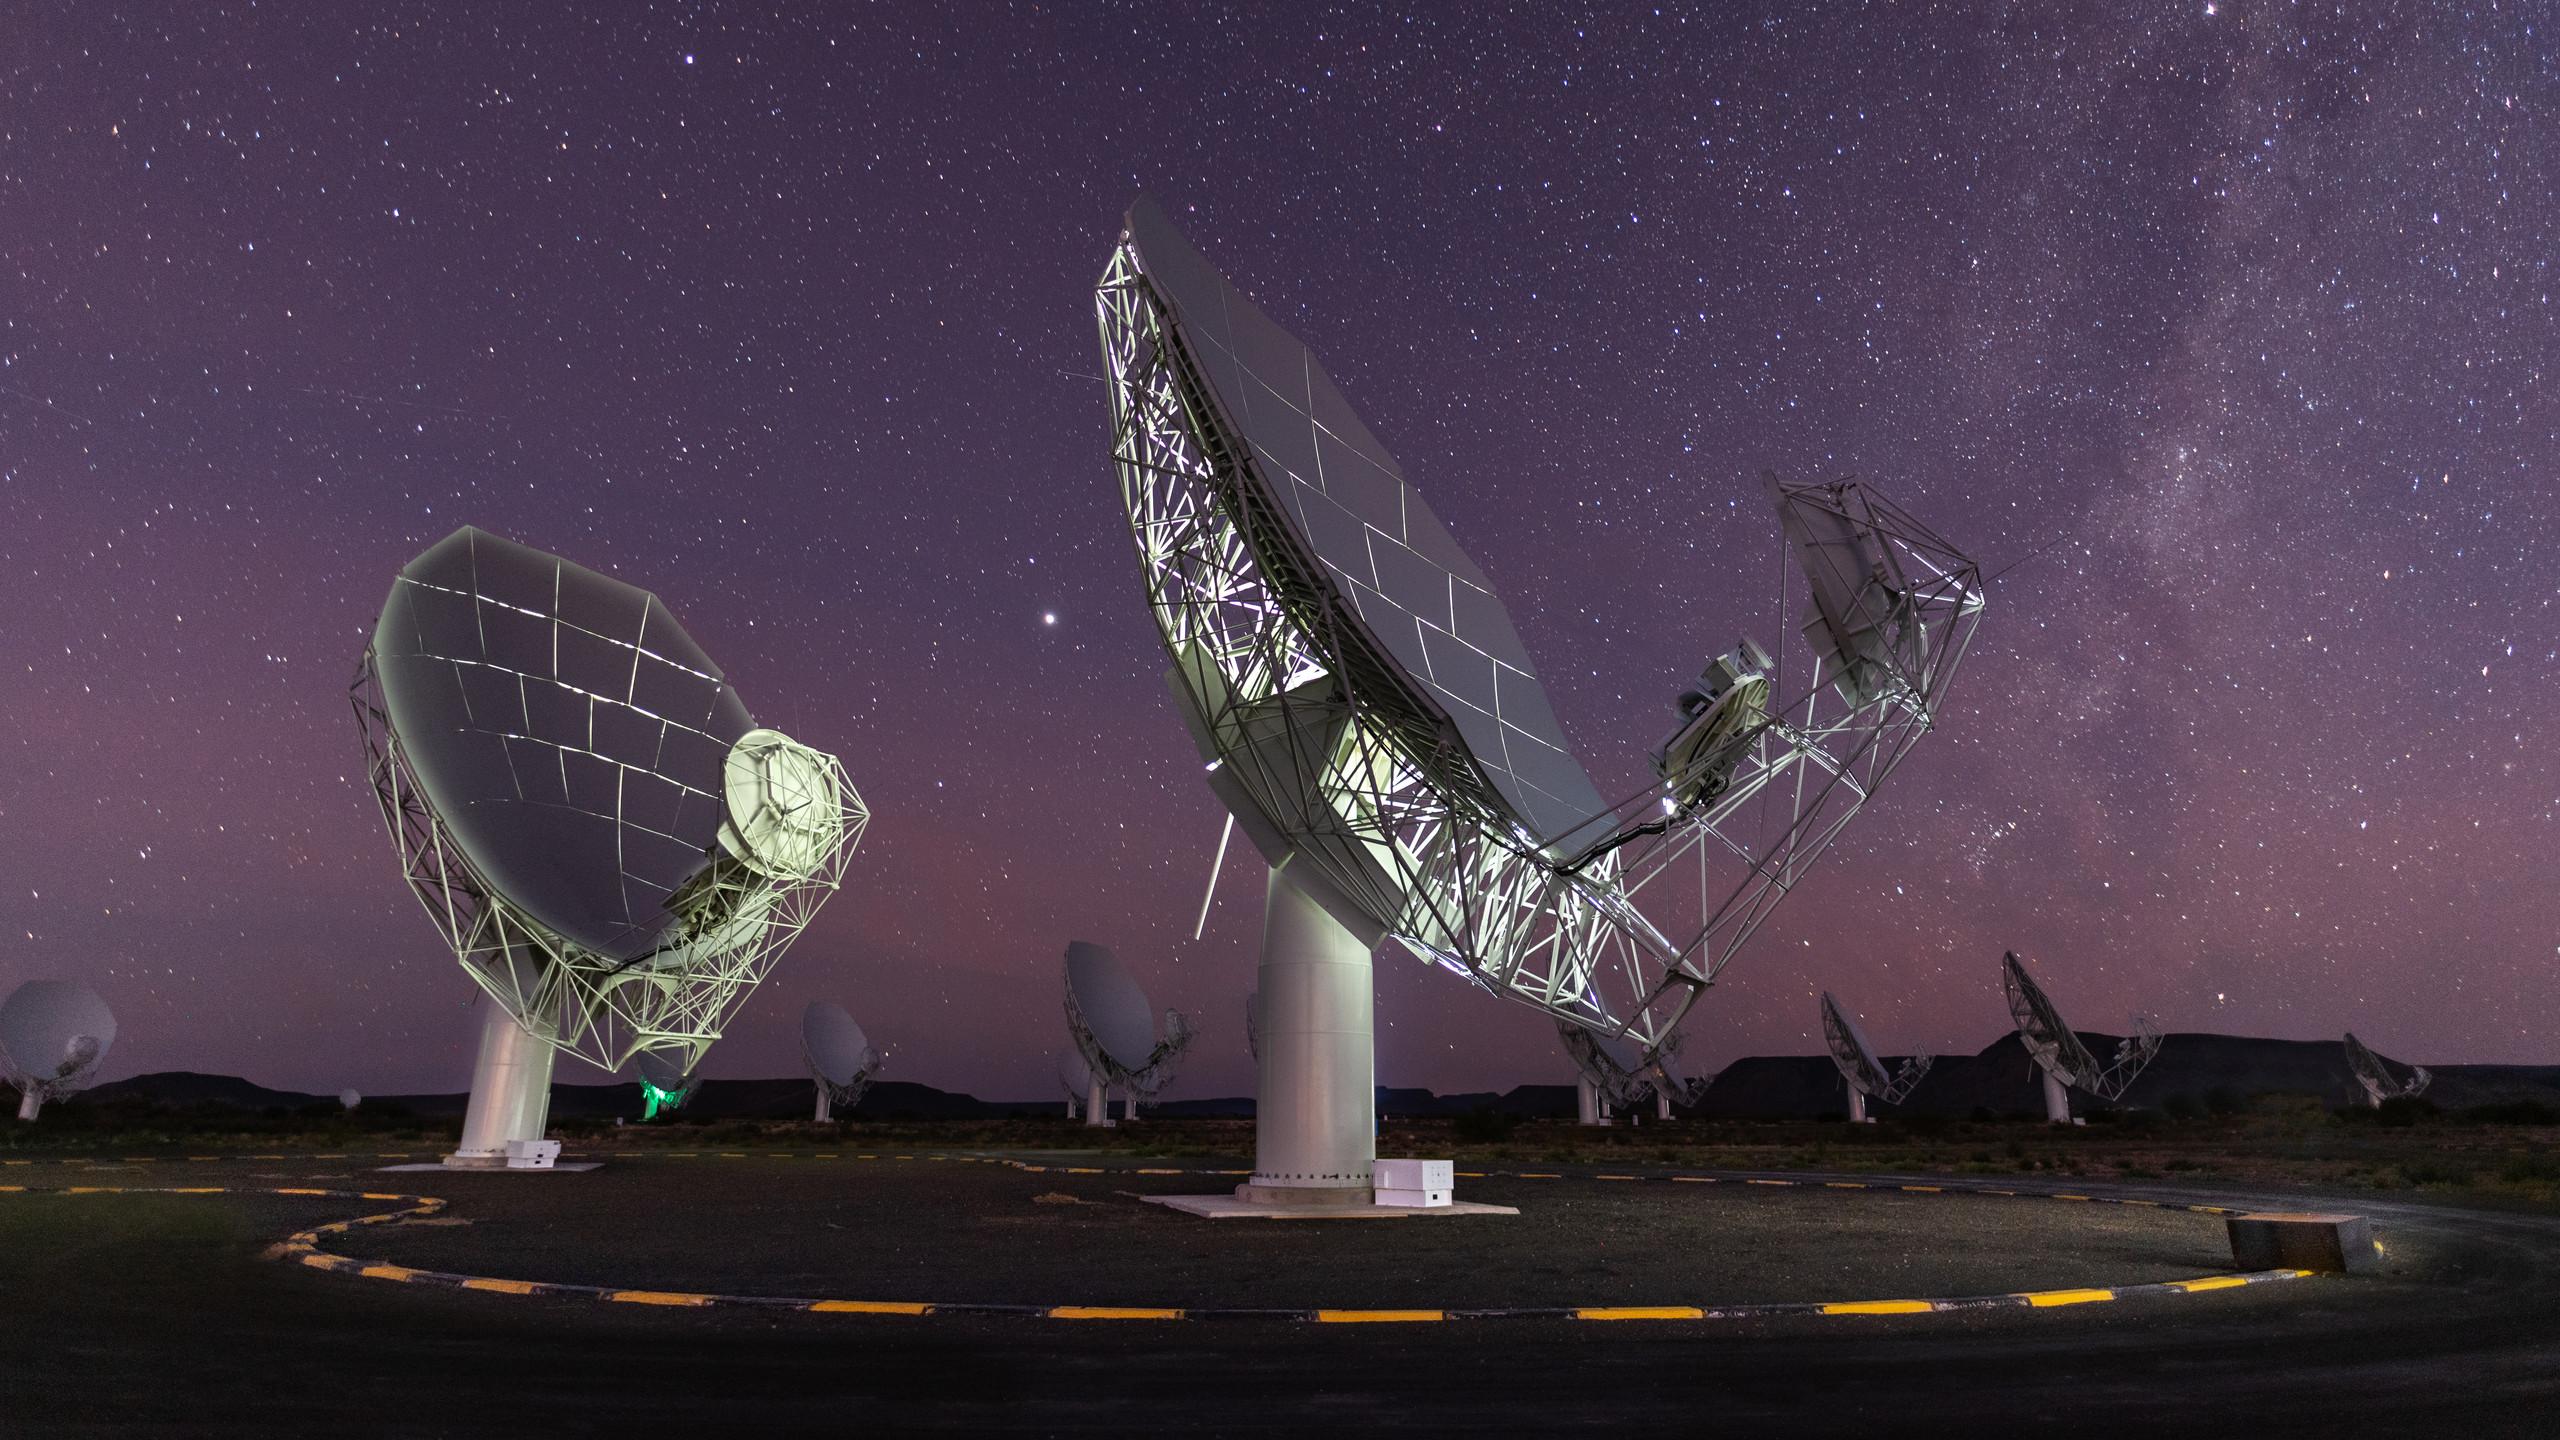 Night sky above Meerkat dishes